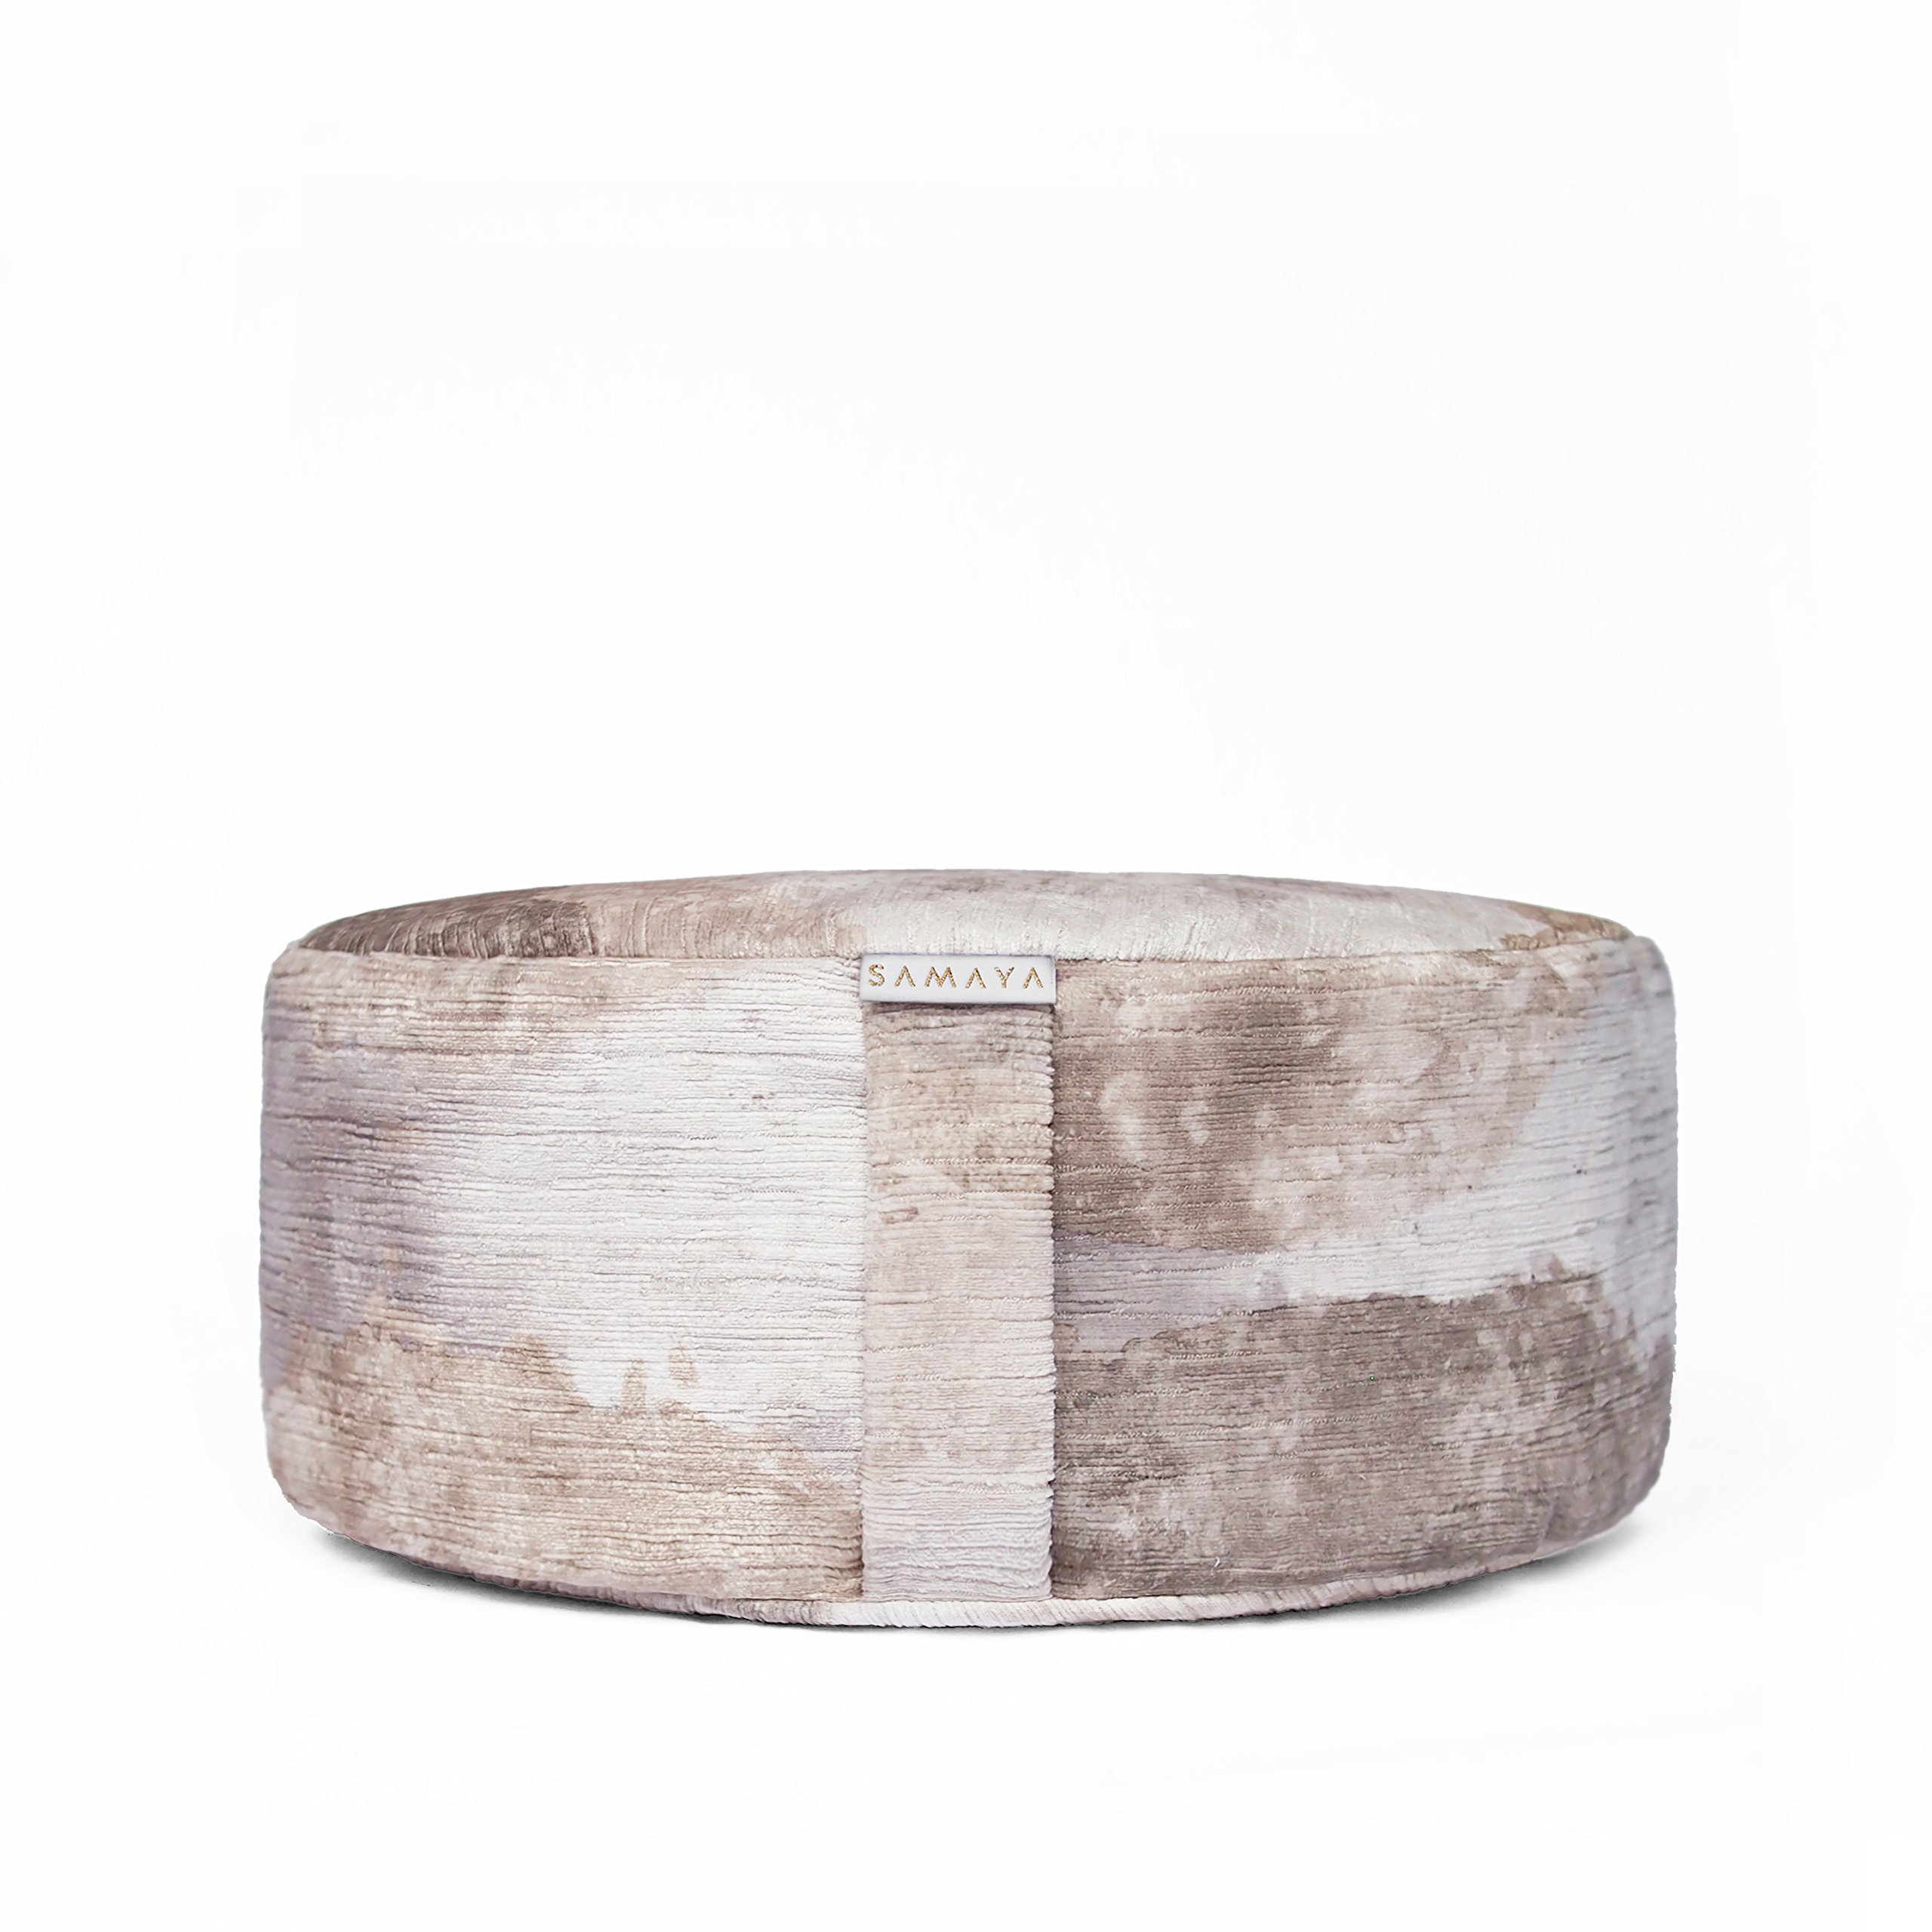 SAMAYA Meditation Cushion | Velvet Floor Pillow Zafu | Buckwheat Millet Filling | Designer Home | Made in USA (Luna)